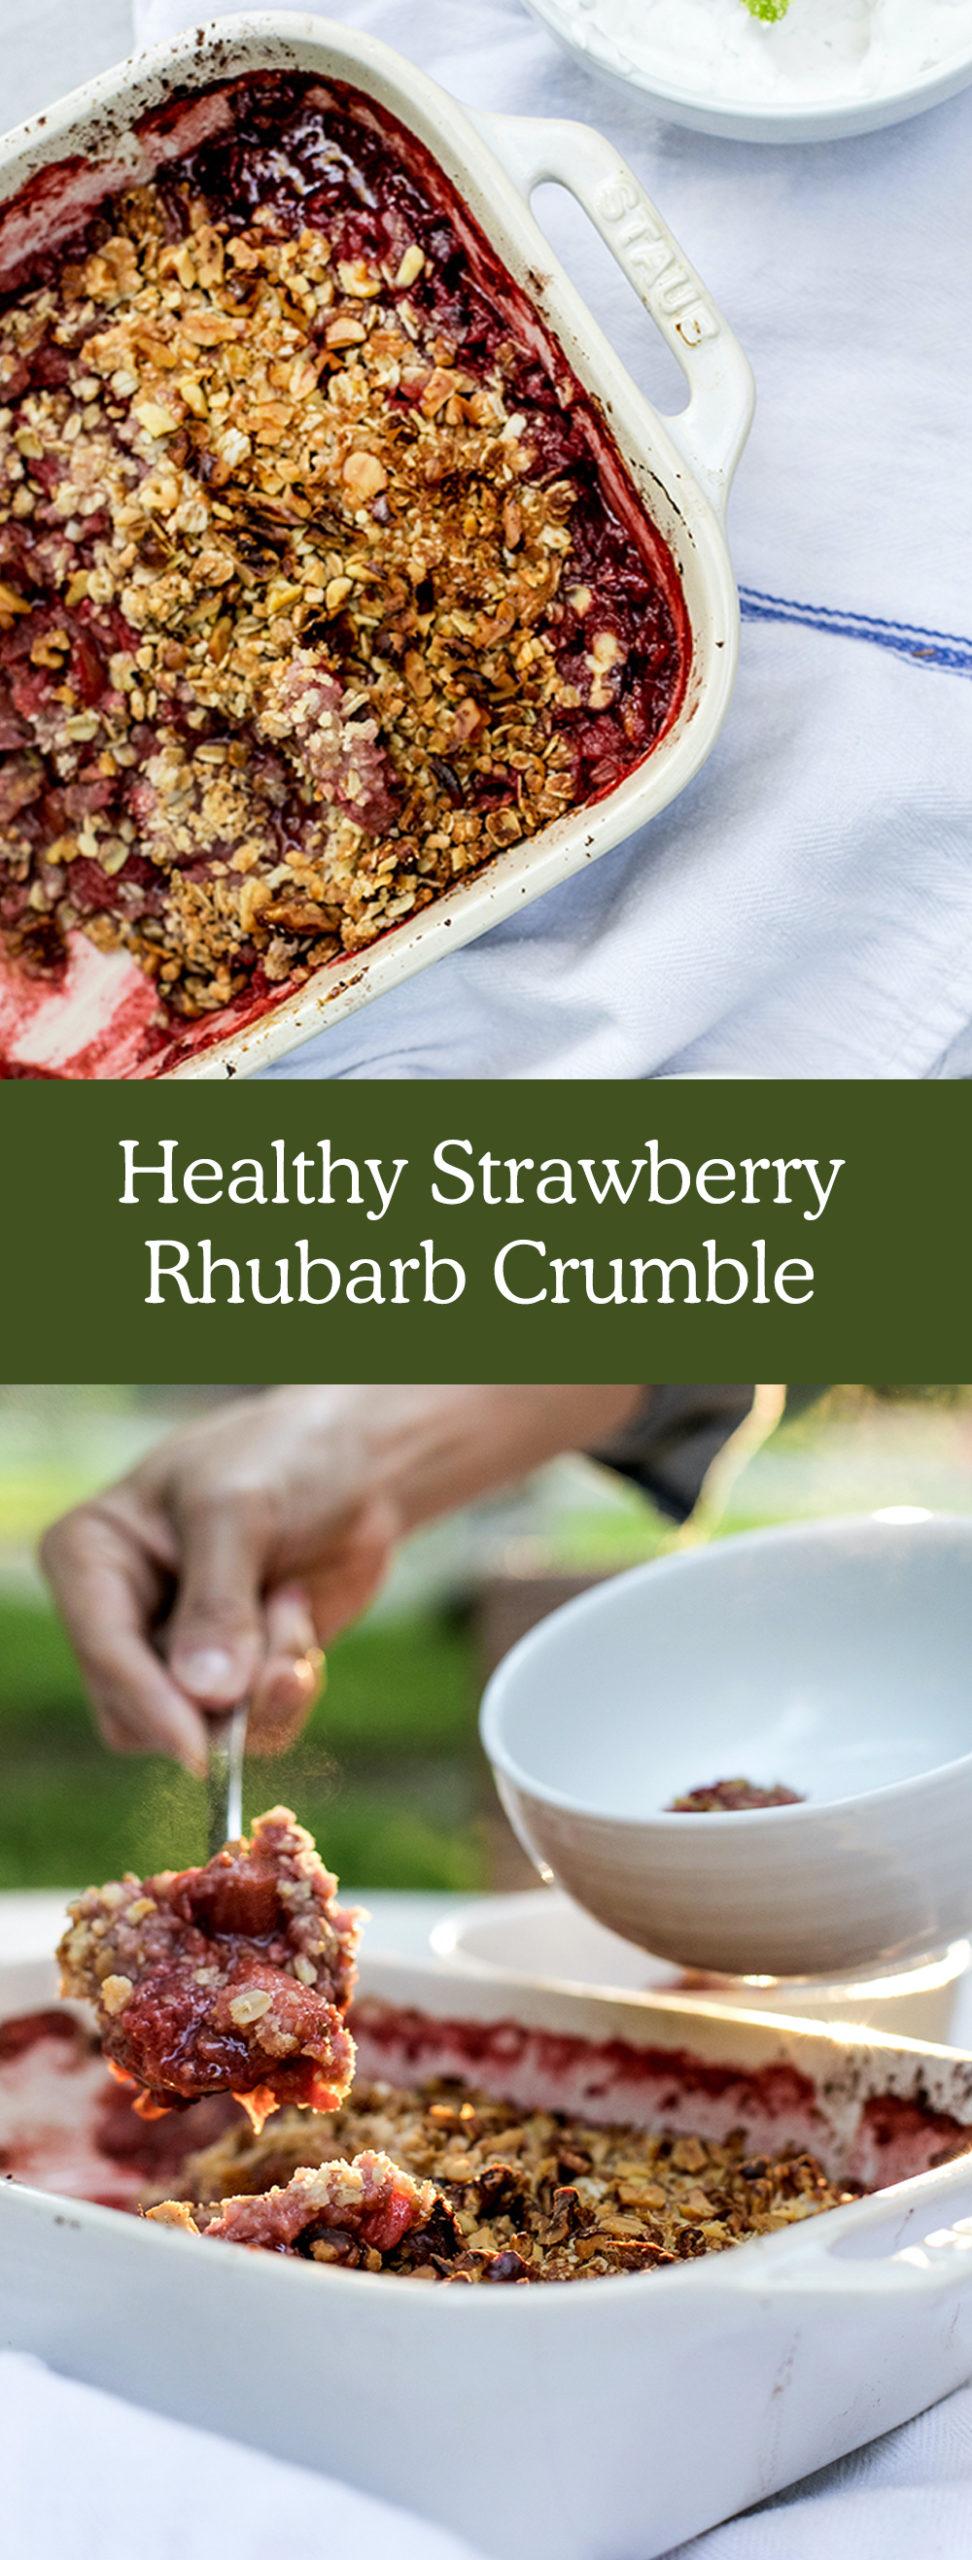 Healthy Strawberry Rhubarb Recipe for Summer - The Fresh Exchange